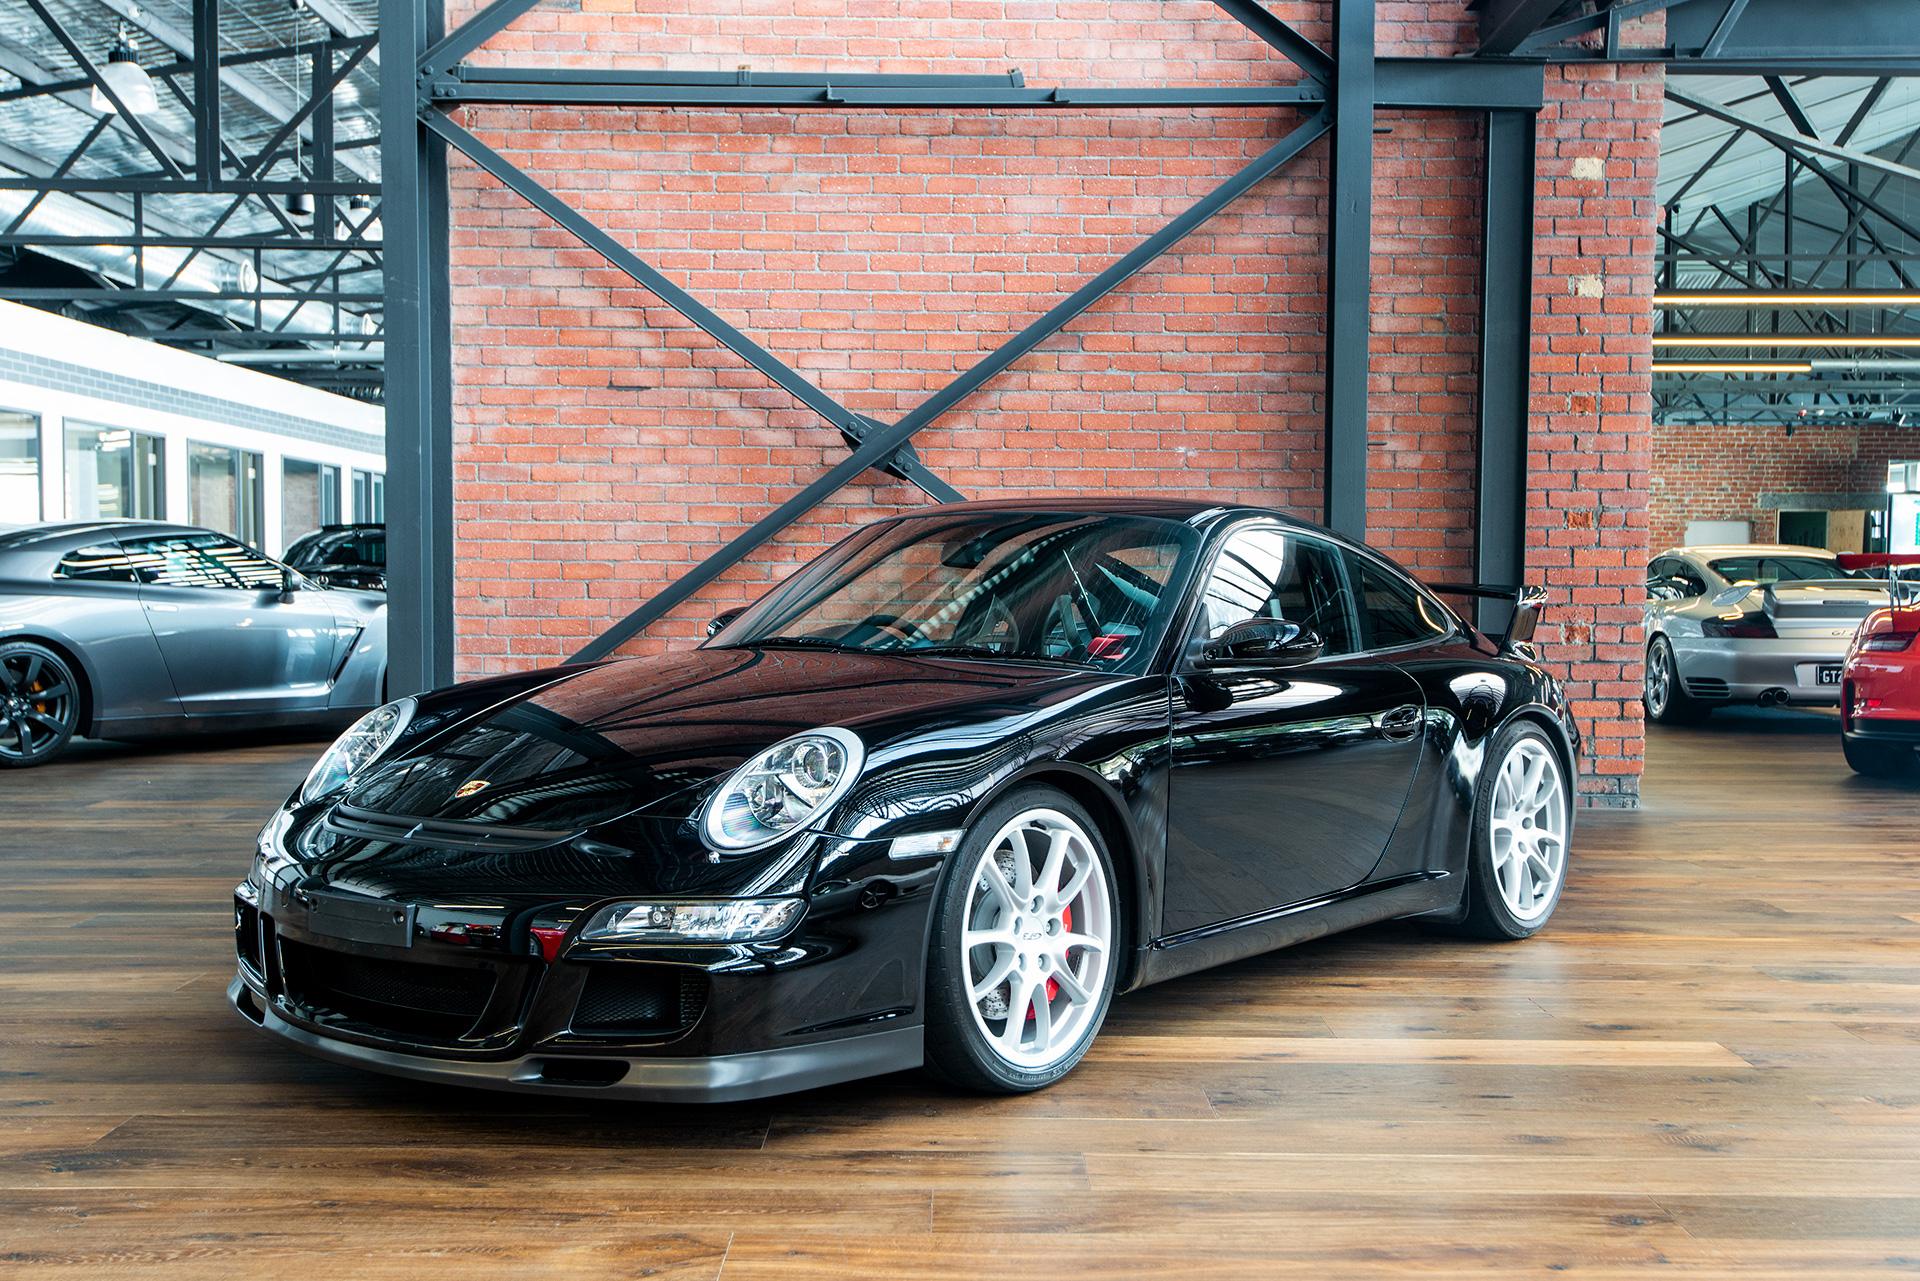 2007 911 997 Gt3 Black Richmonds Classic And Prestige Cars Storage And Sales Adelaide Australia